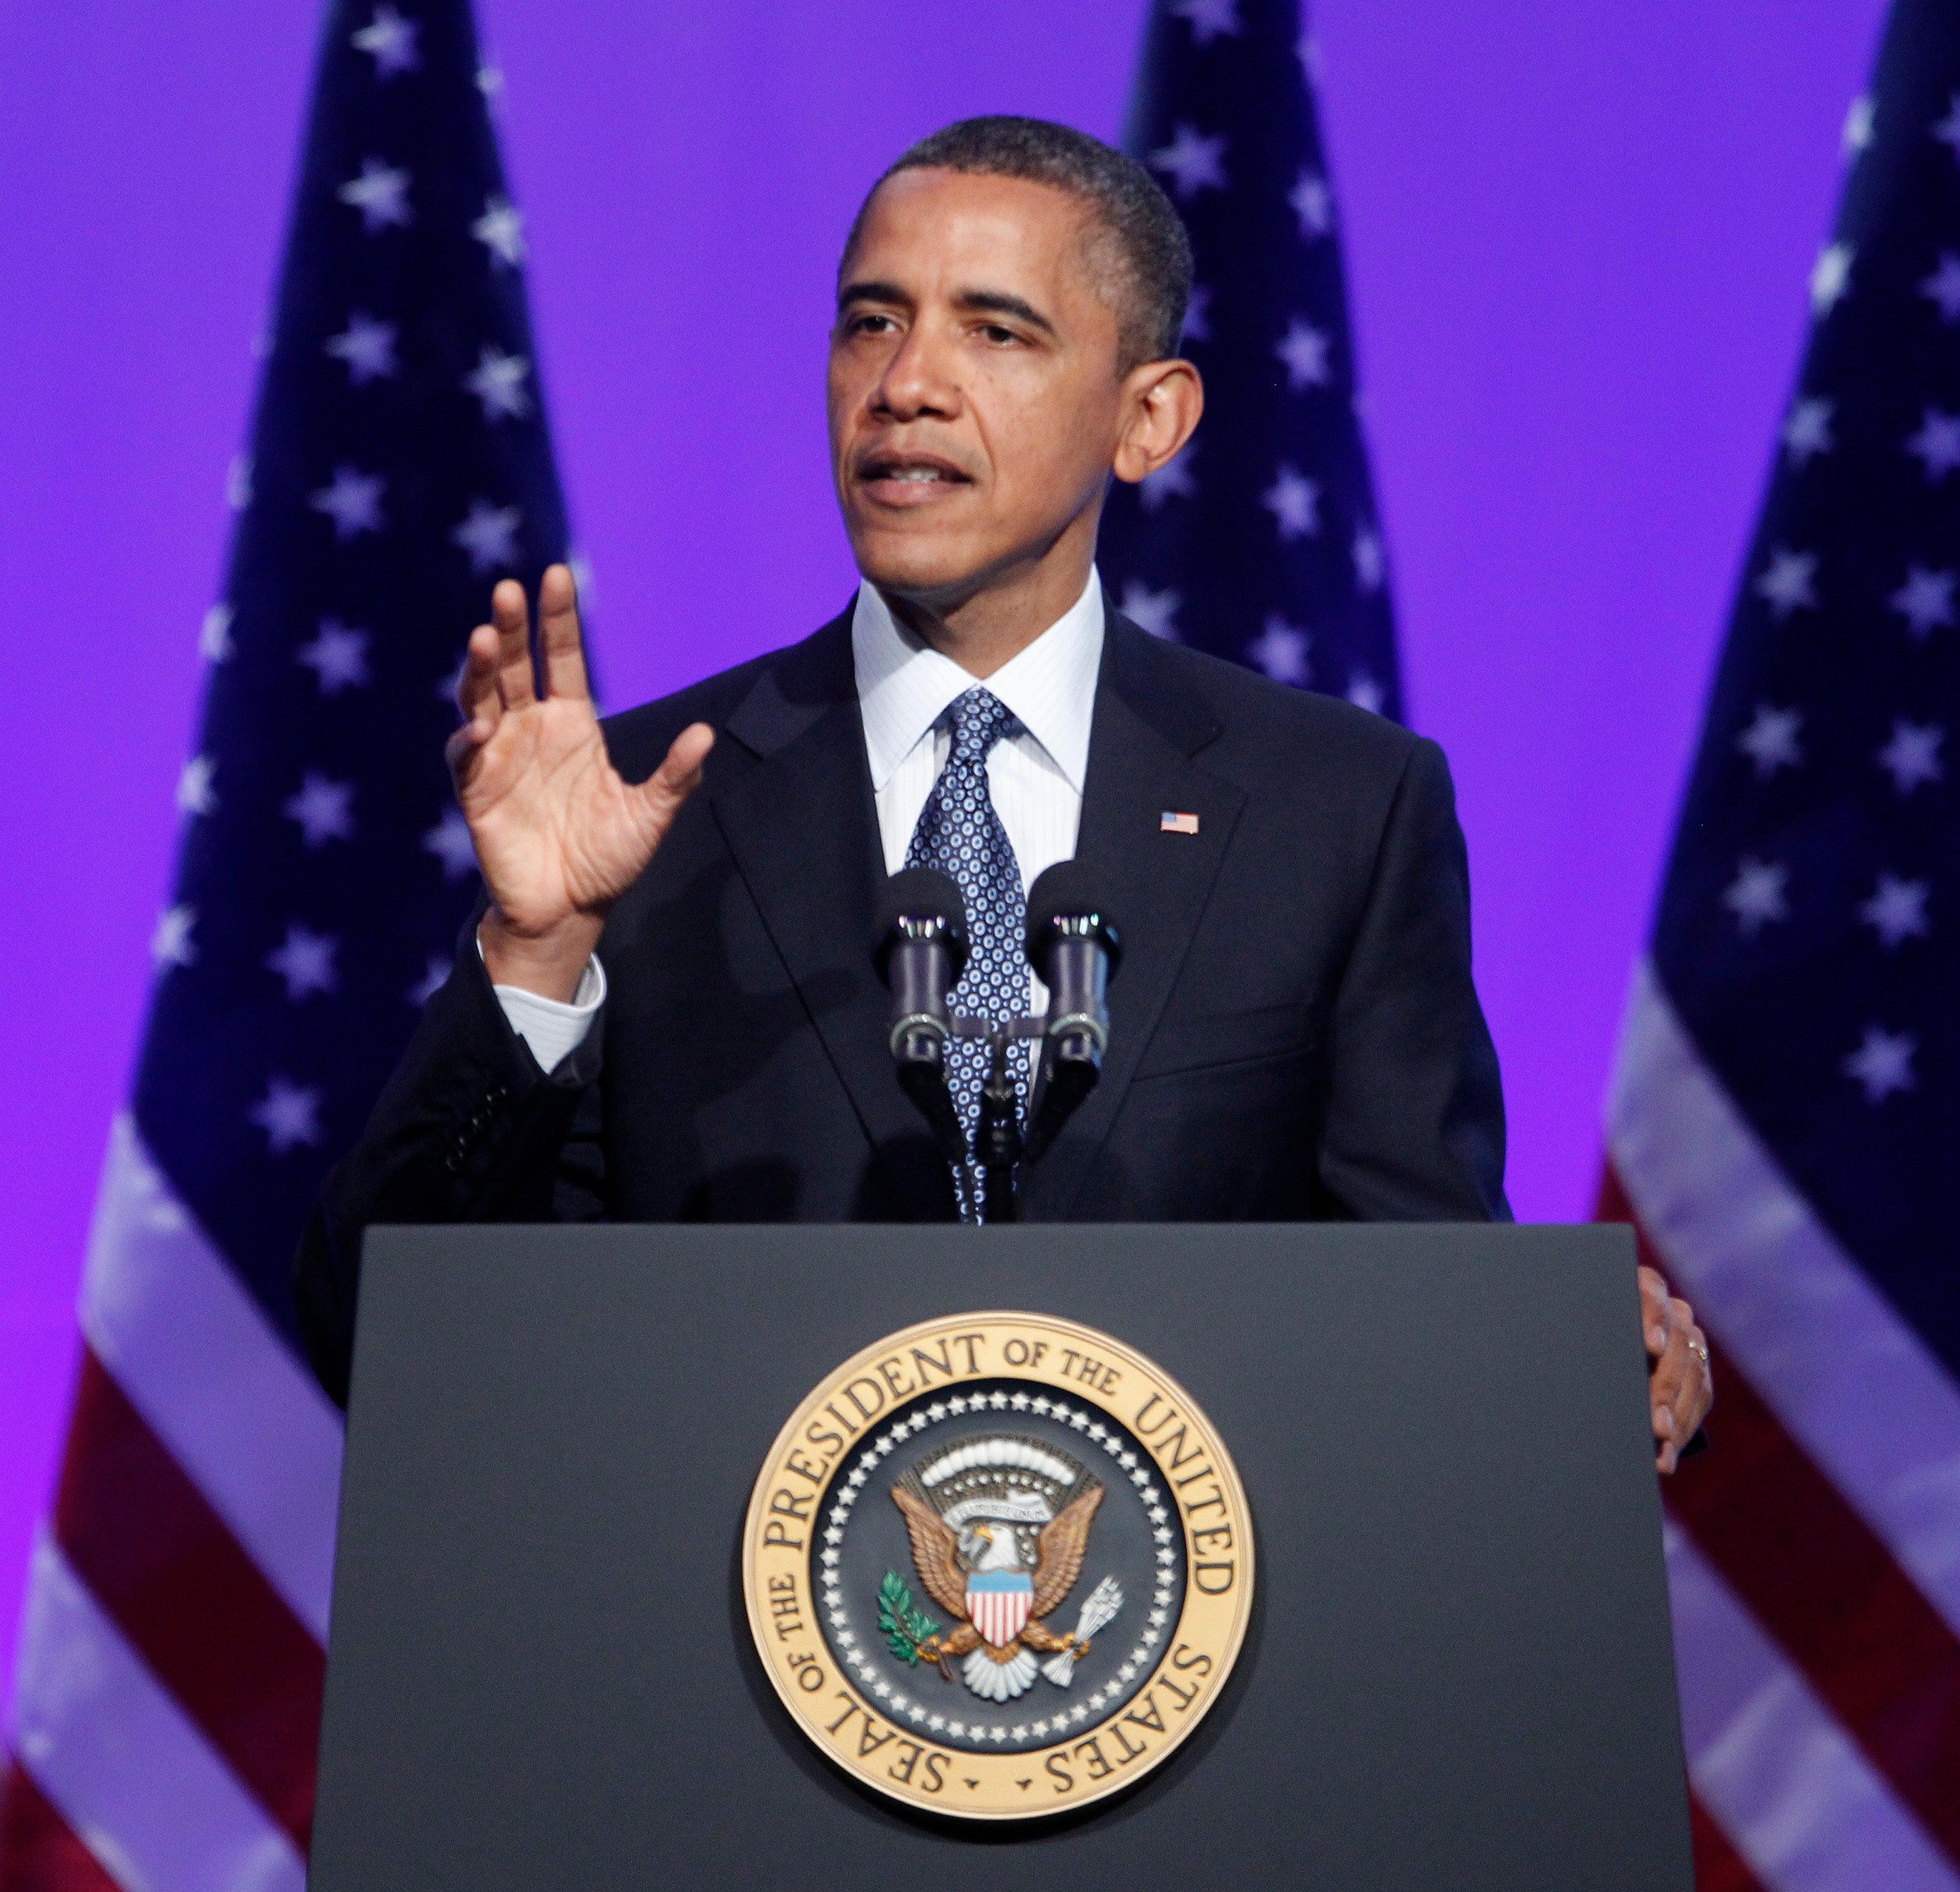 President Obama Talks Importance of Easter at Prayer Breakfast